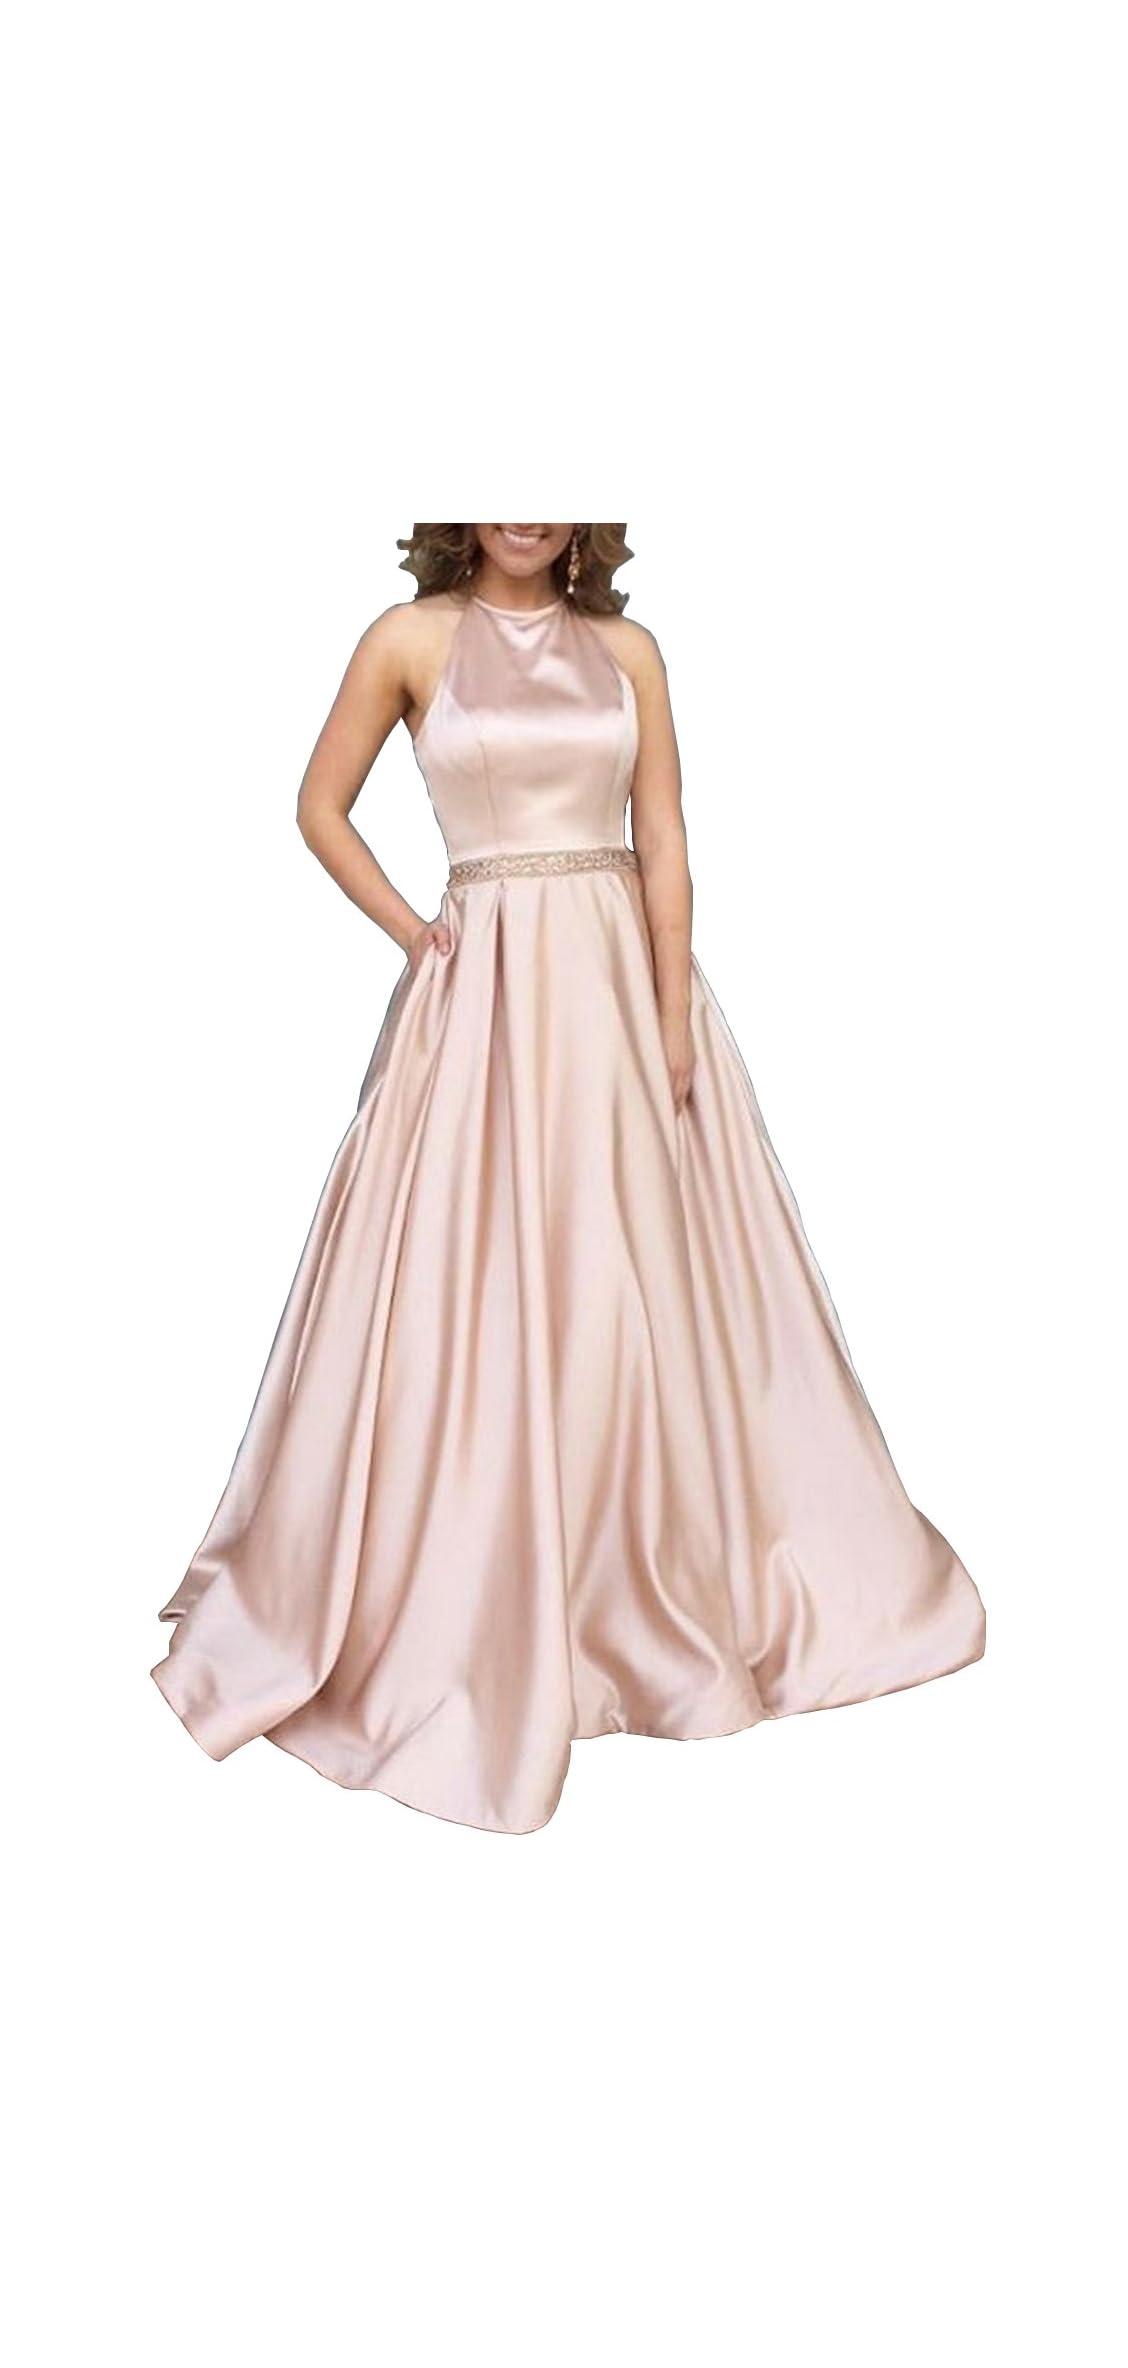 Women's Halter A-line Beaded Satin Evening Prom Dress Long Gown